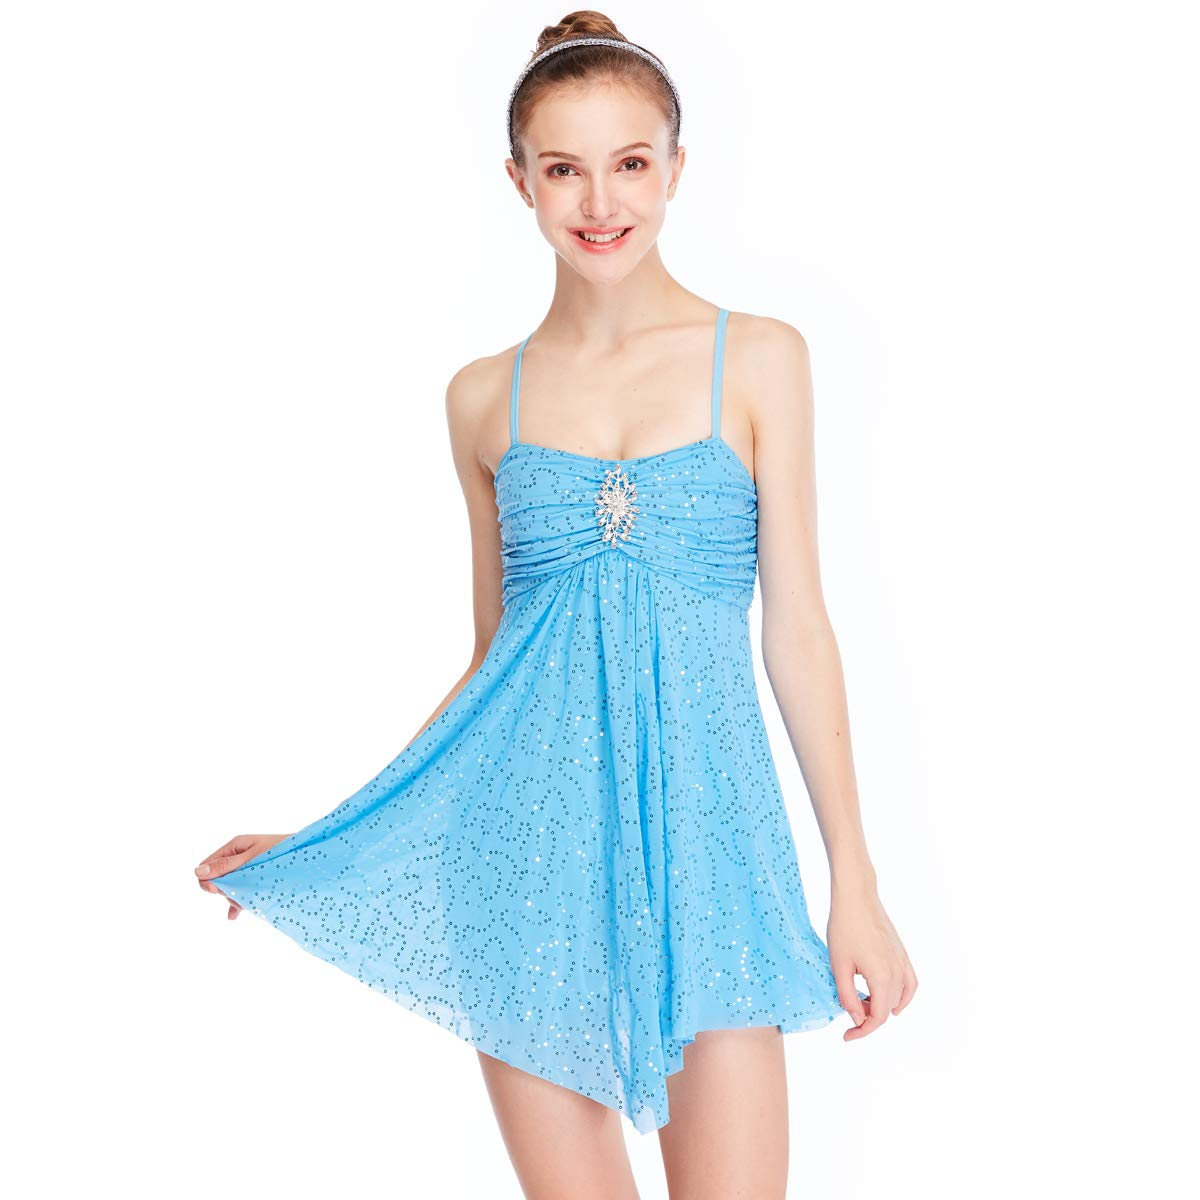 63dae8b264f8 Amazon.com: MiDee Dance Costume Lyrical Dress Full Sequins Camisole Ice  Skating Dresses (XSC, Blue): Clothing